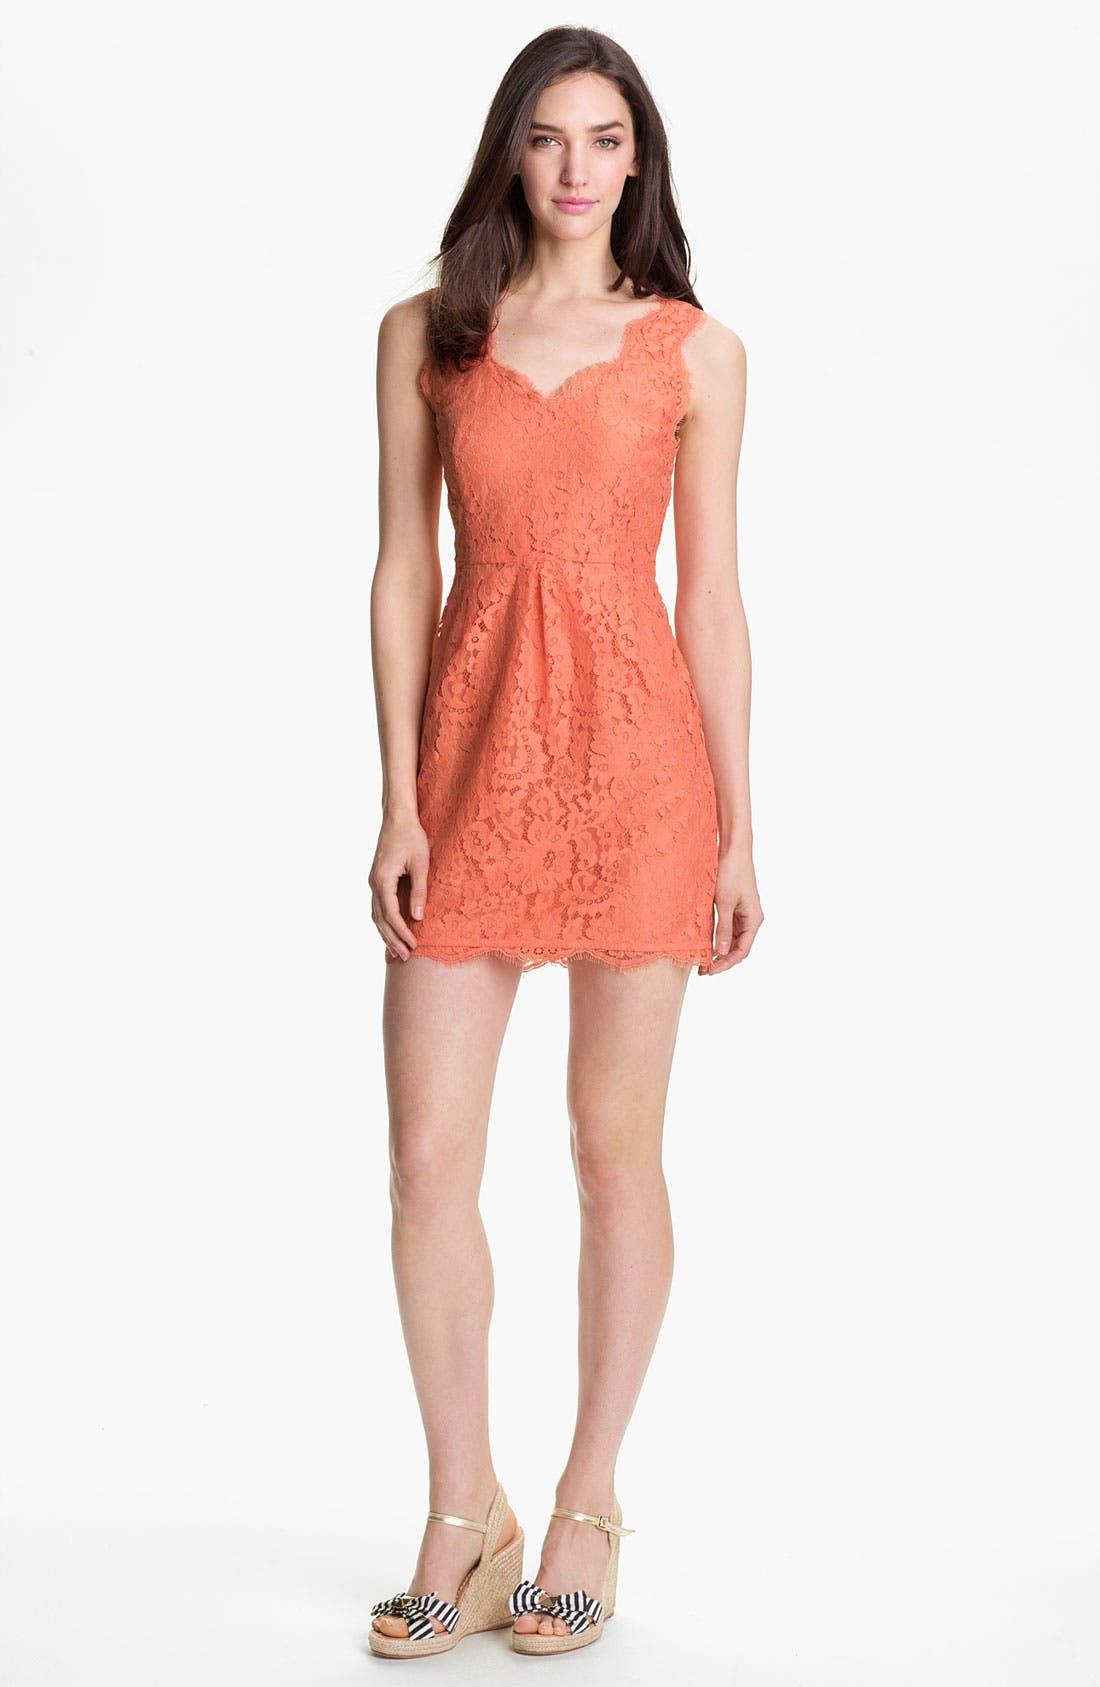 Alternate Image 1 Selected - Joie 'Rori' Sleeveless Lace Minidress